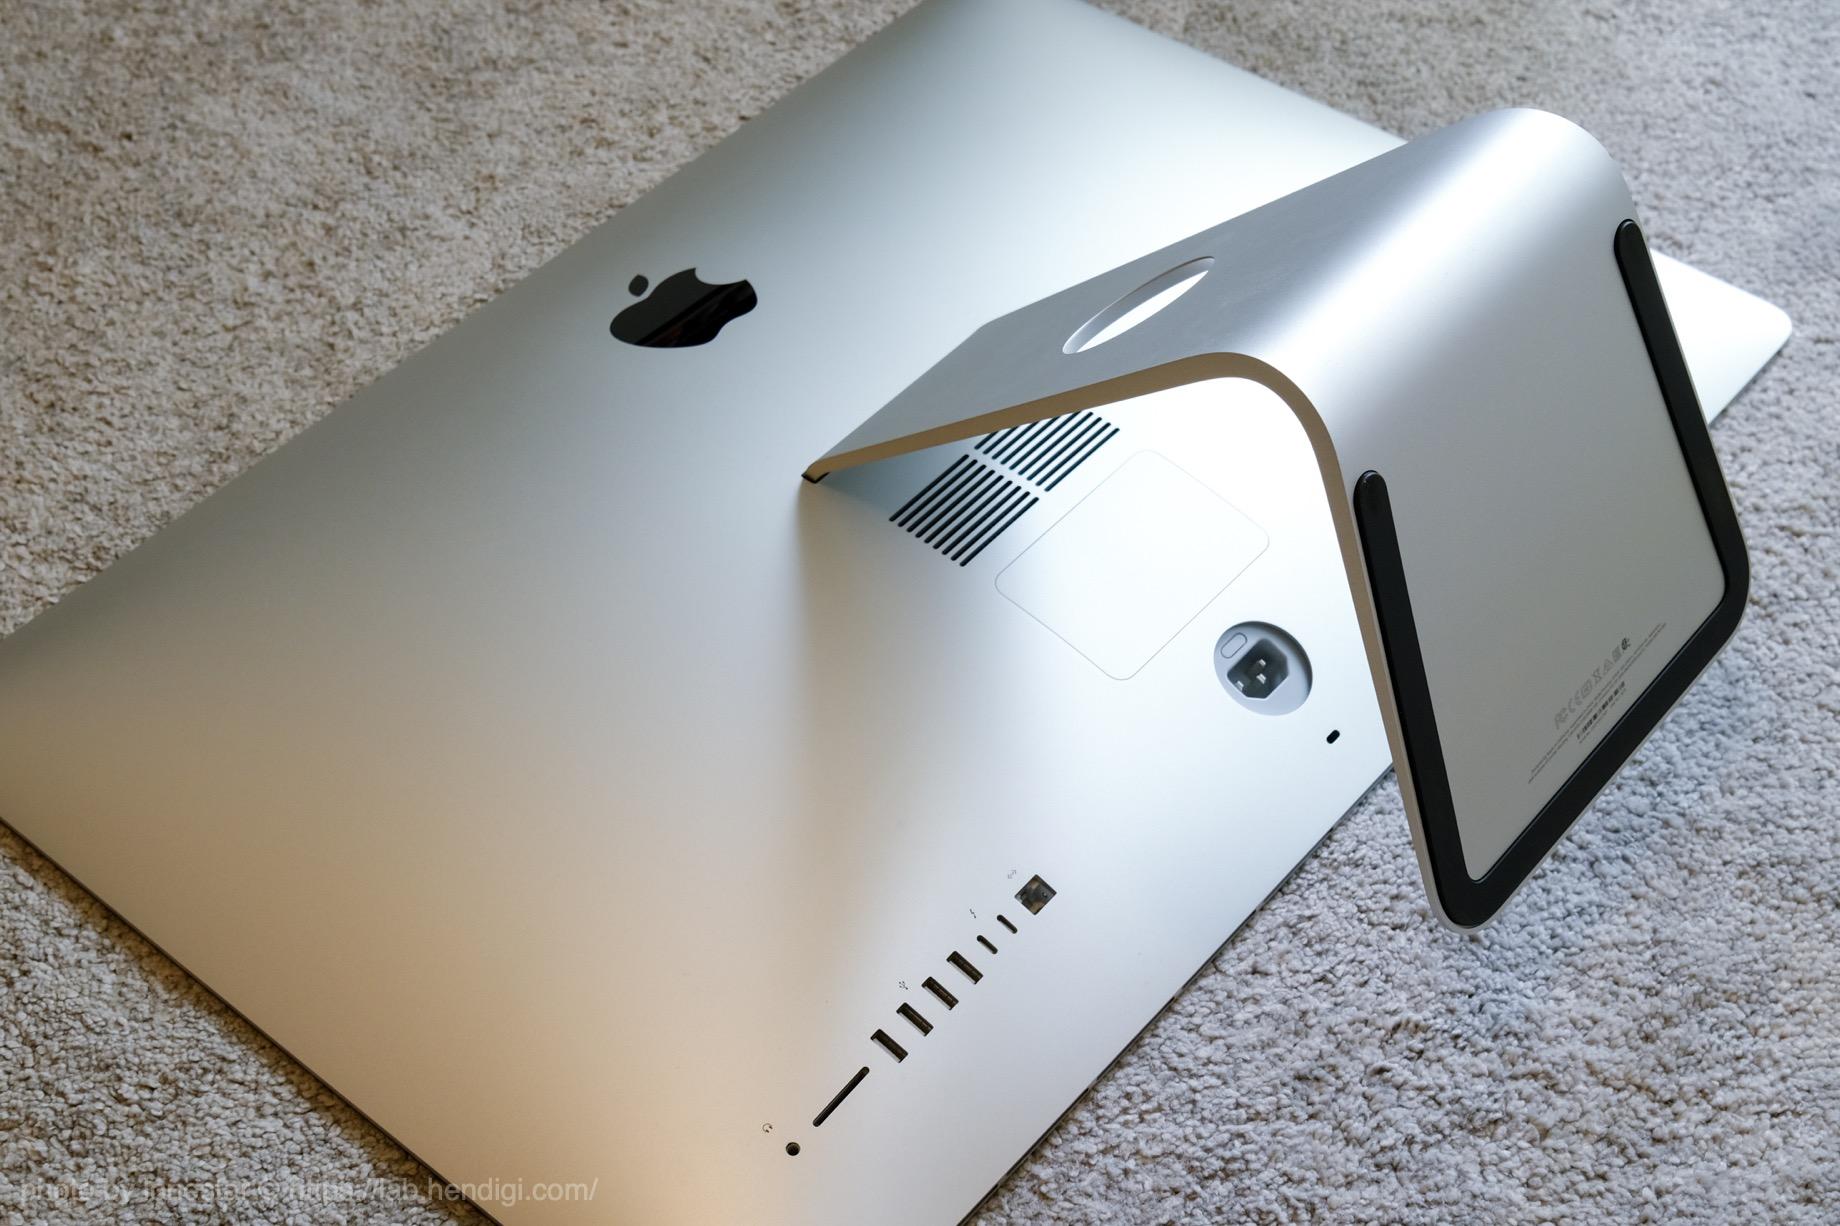 iMac 2017 メモリ 増設